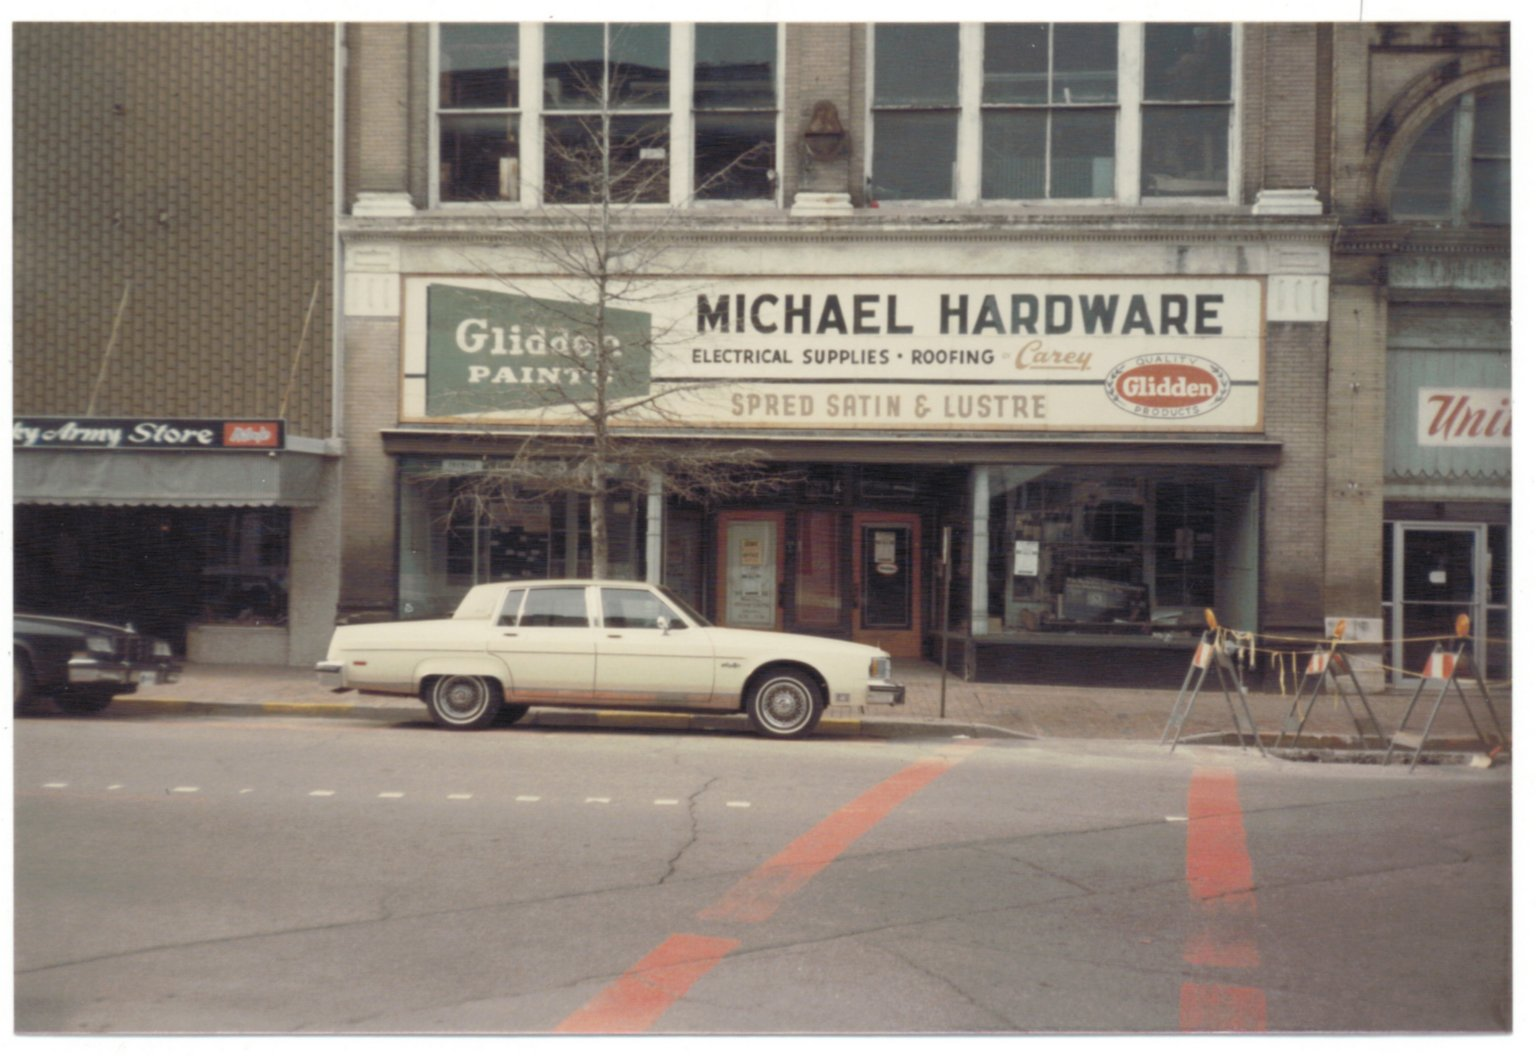 Michael Hardware